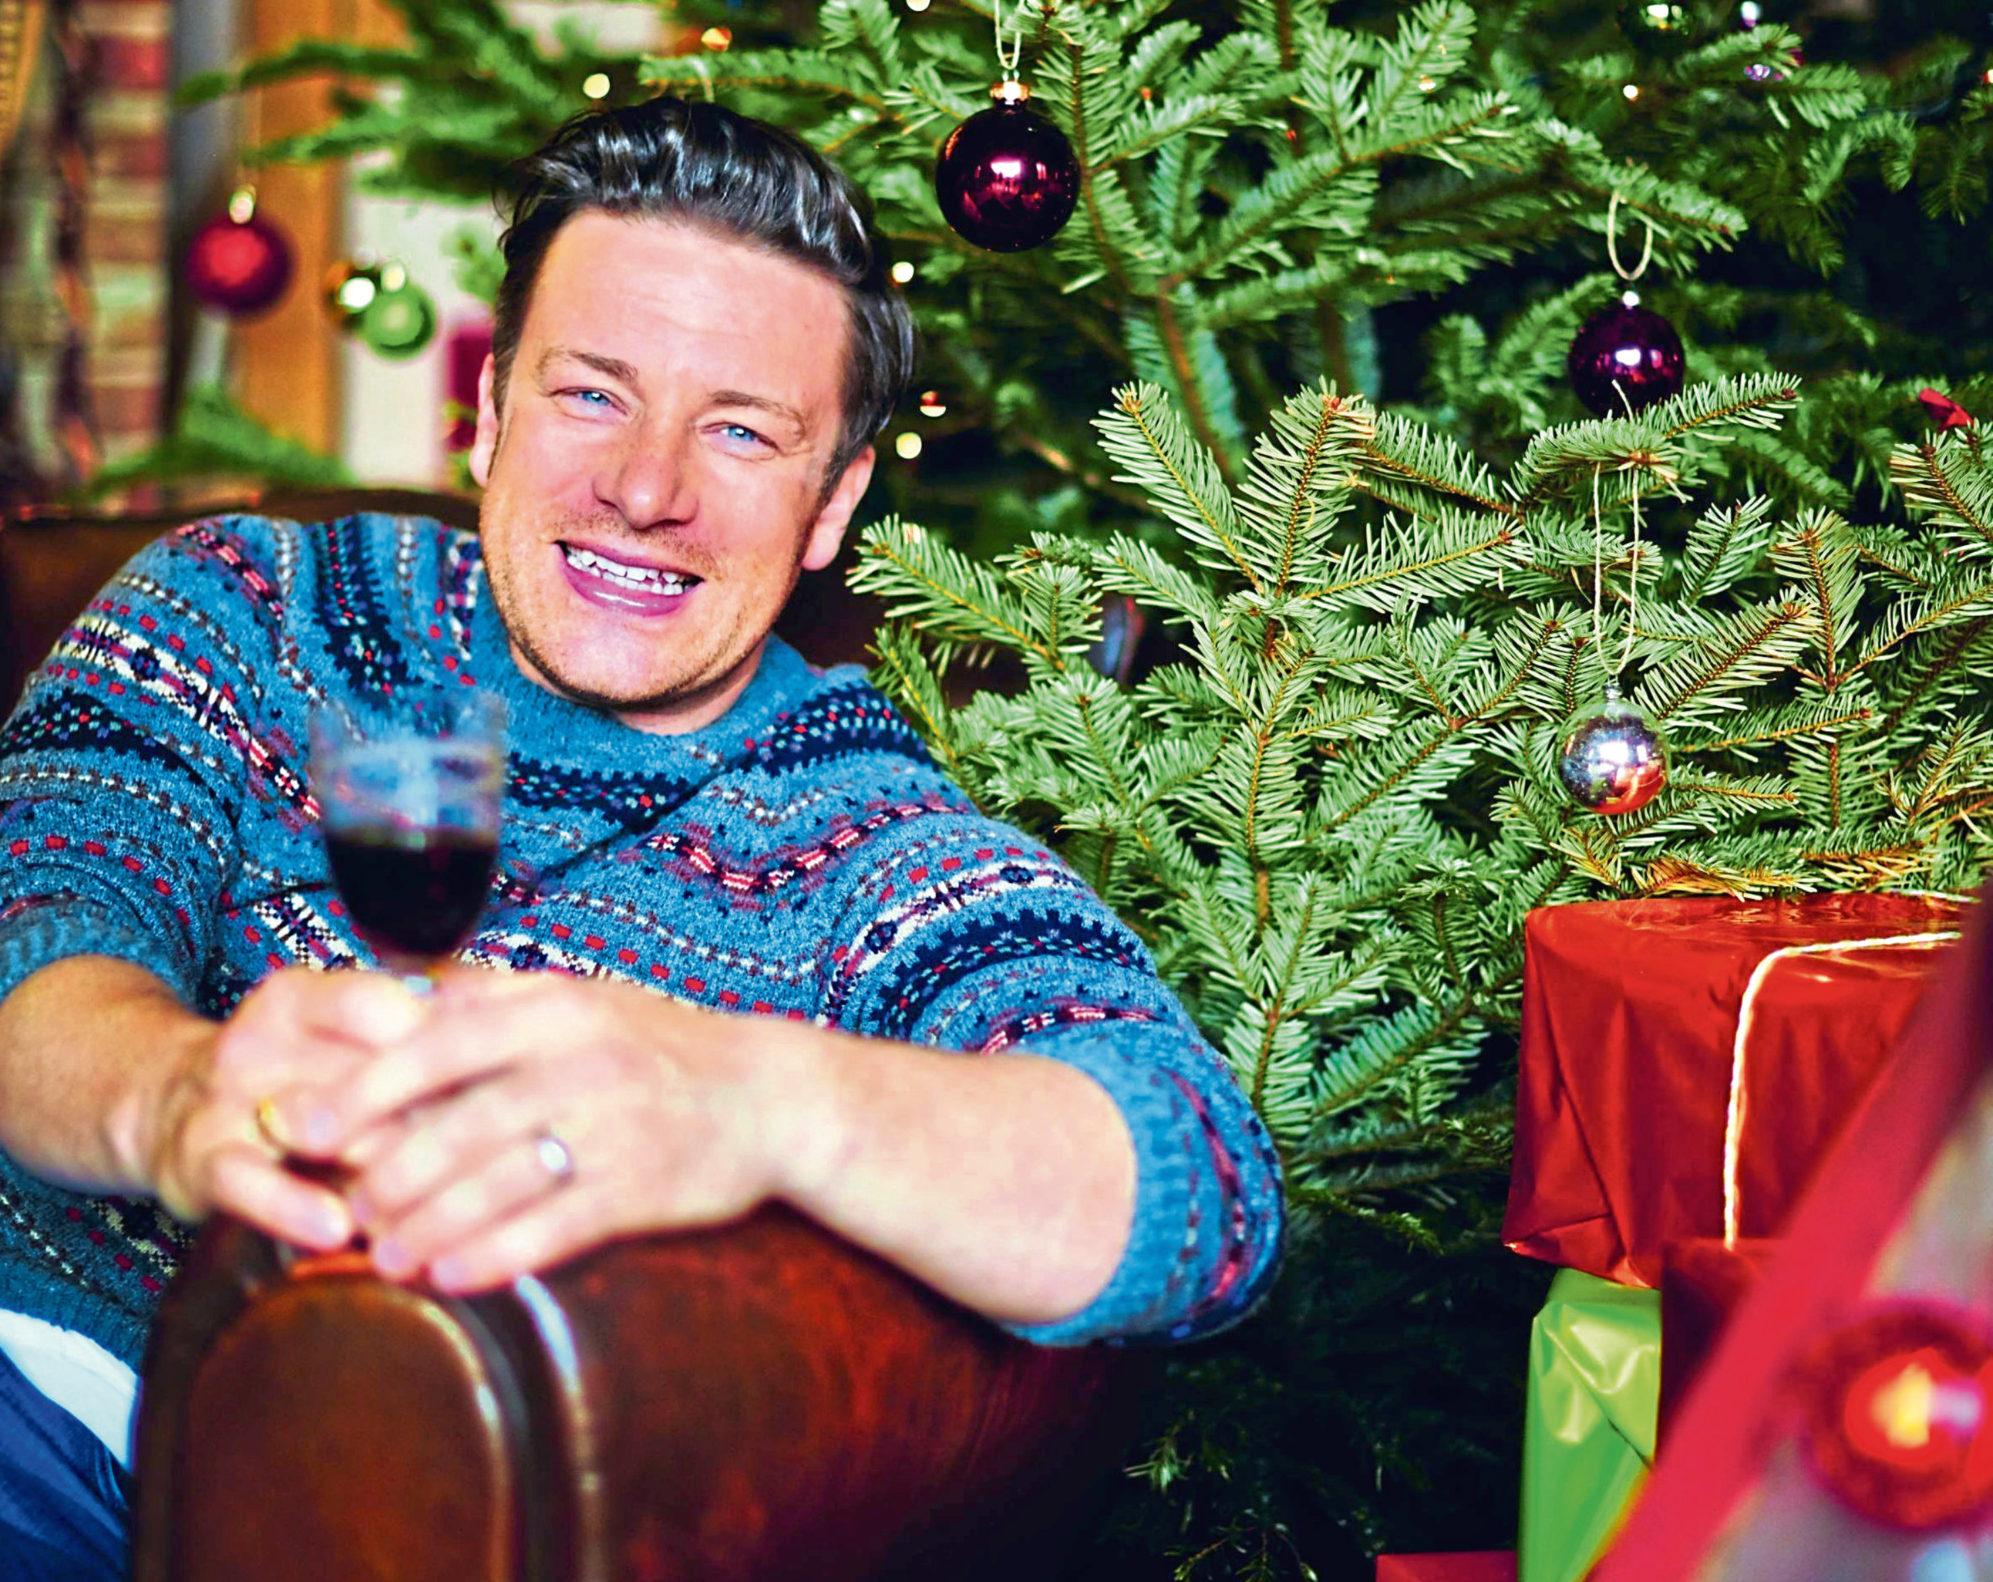 Jamie Oliver will open a deli at Robert Gordon University